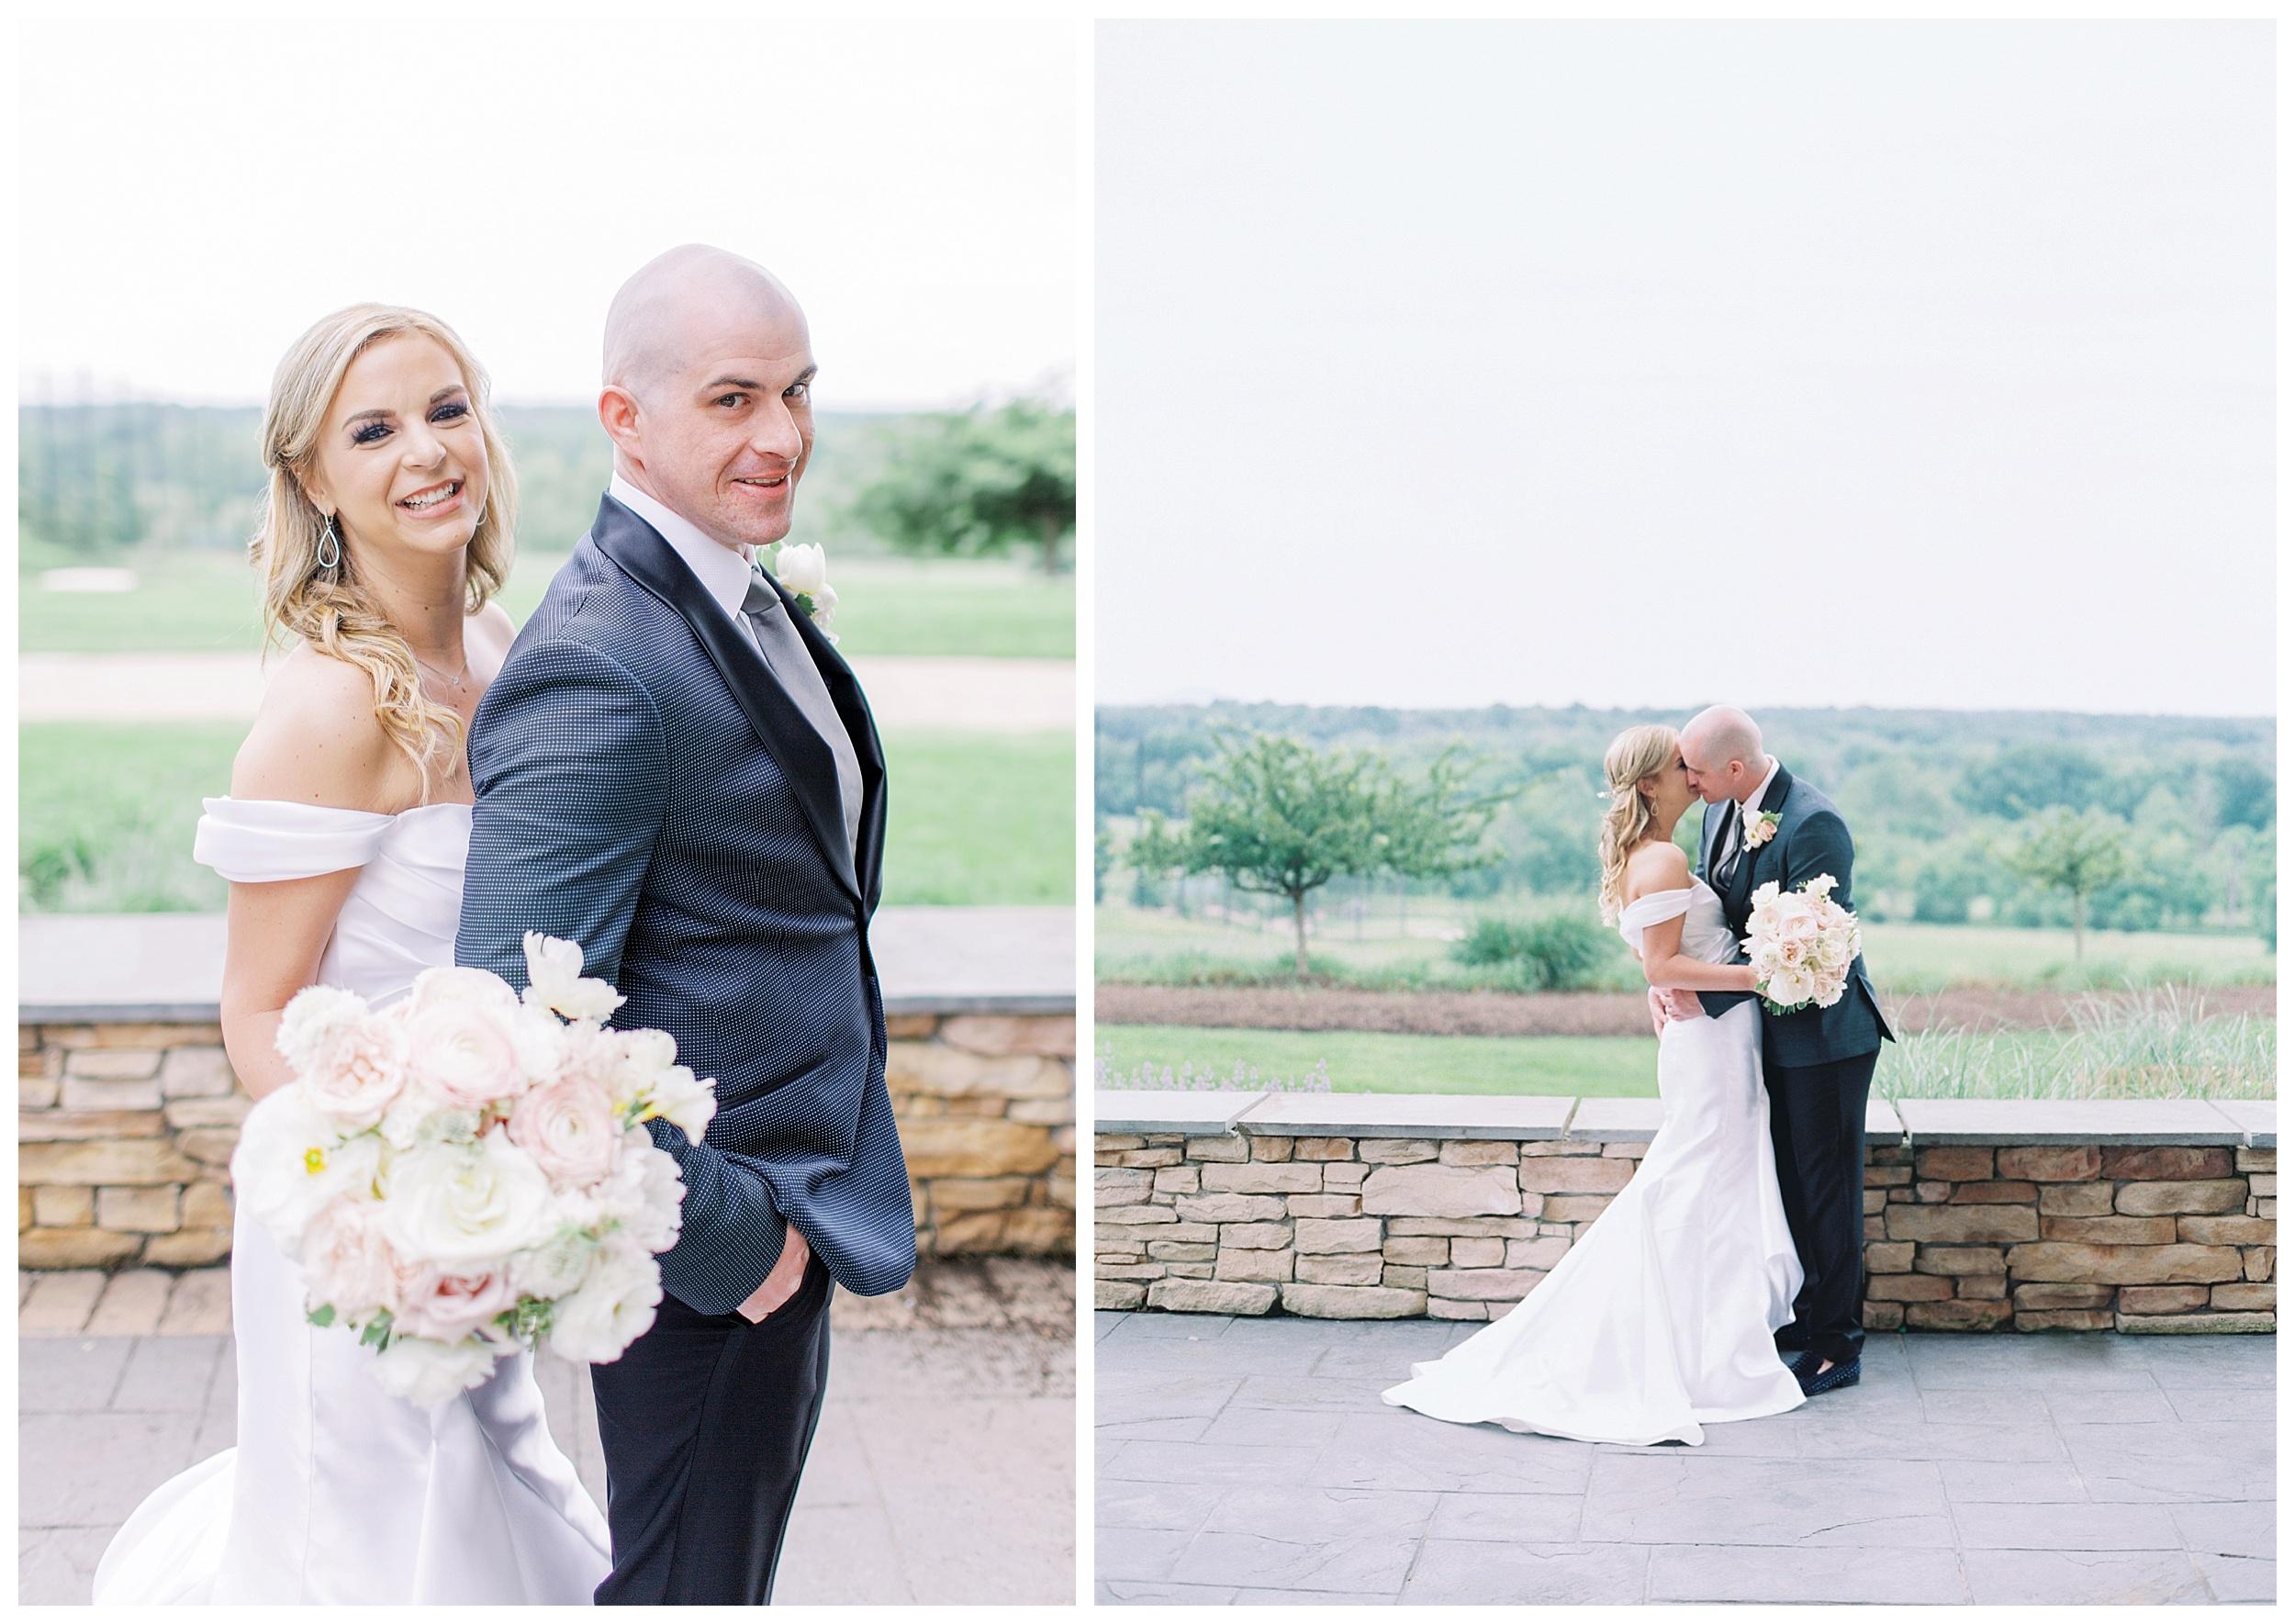 Lansdowne Resort Wedding | Virginia Film Wedding Photographer Kir Tuben_0038.jpg